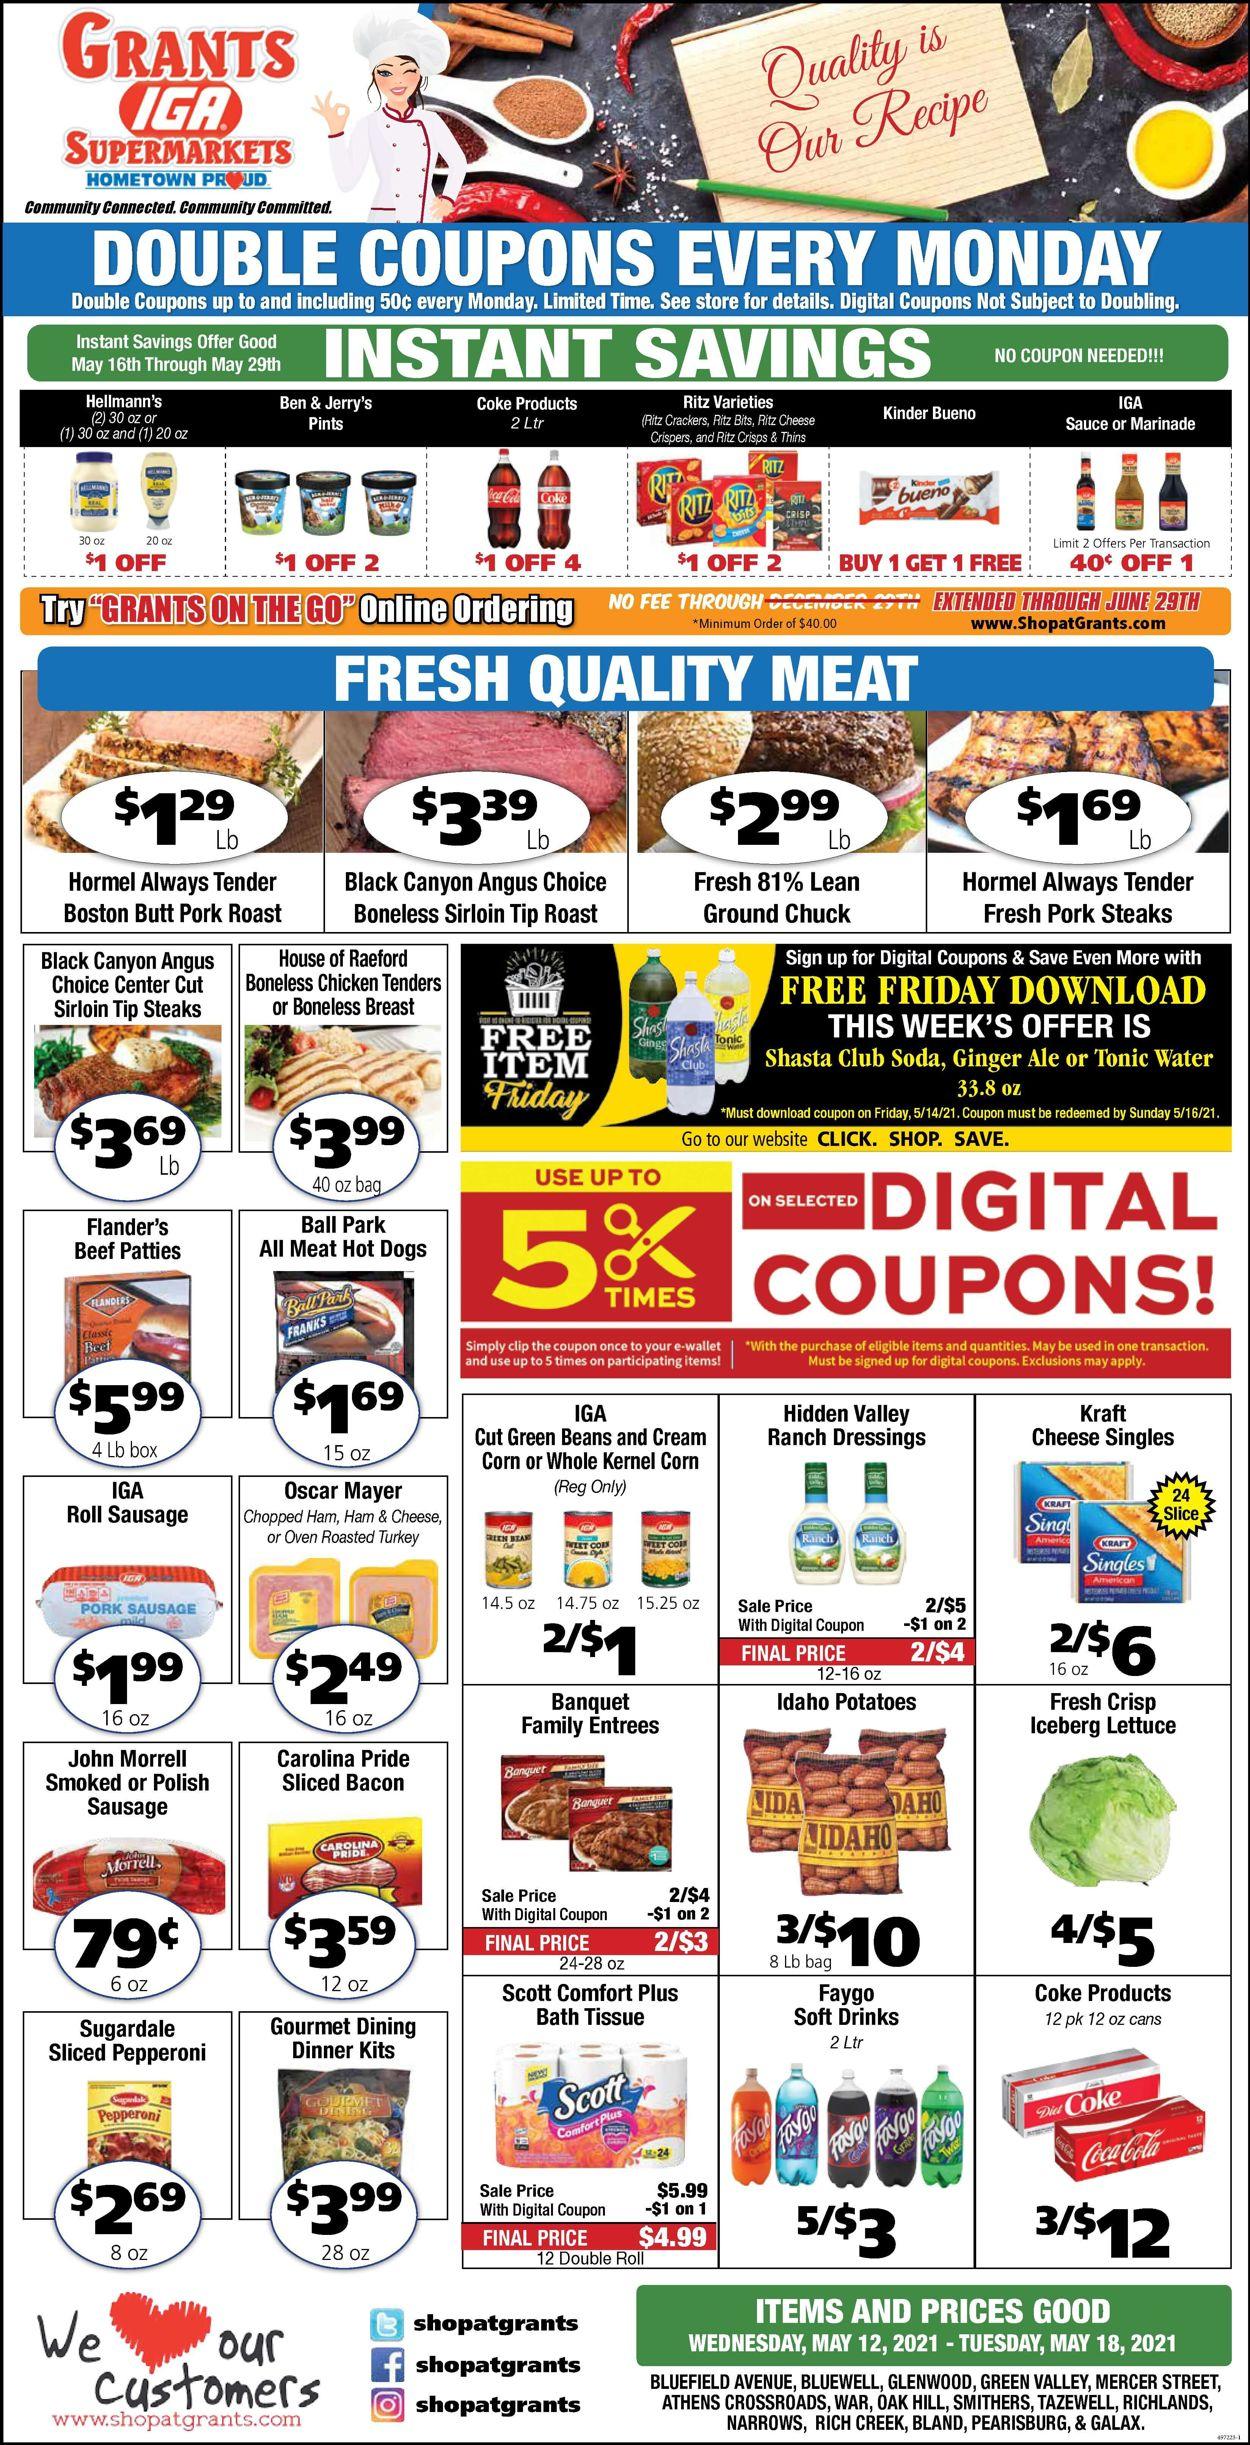 Grant's Supermarket Weekly Ad Circular - valid 05/12-05/18/2021